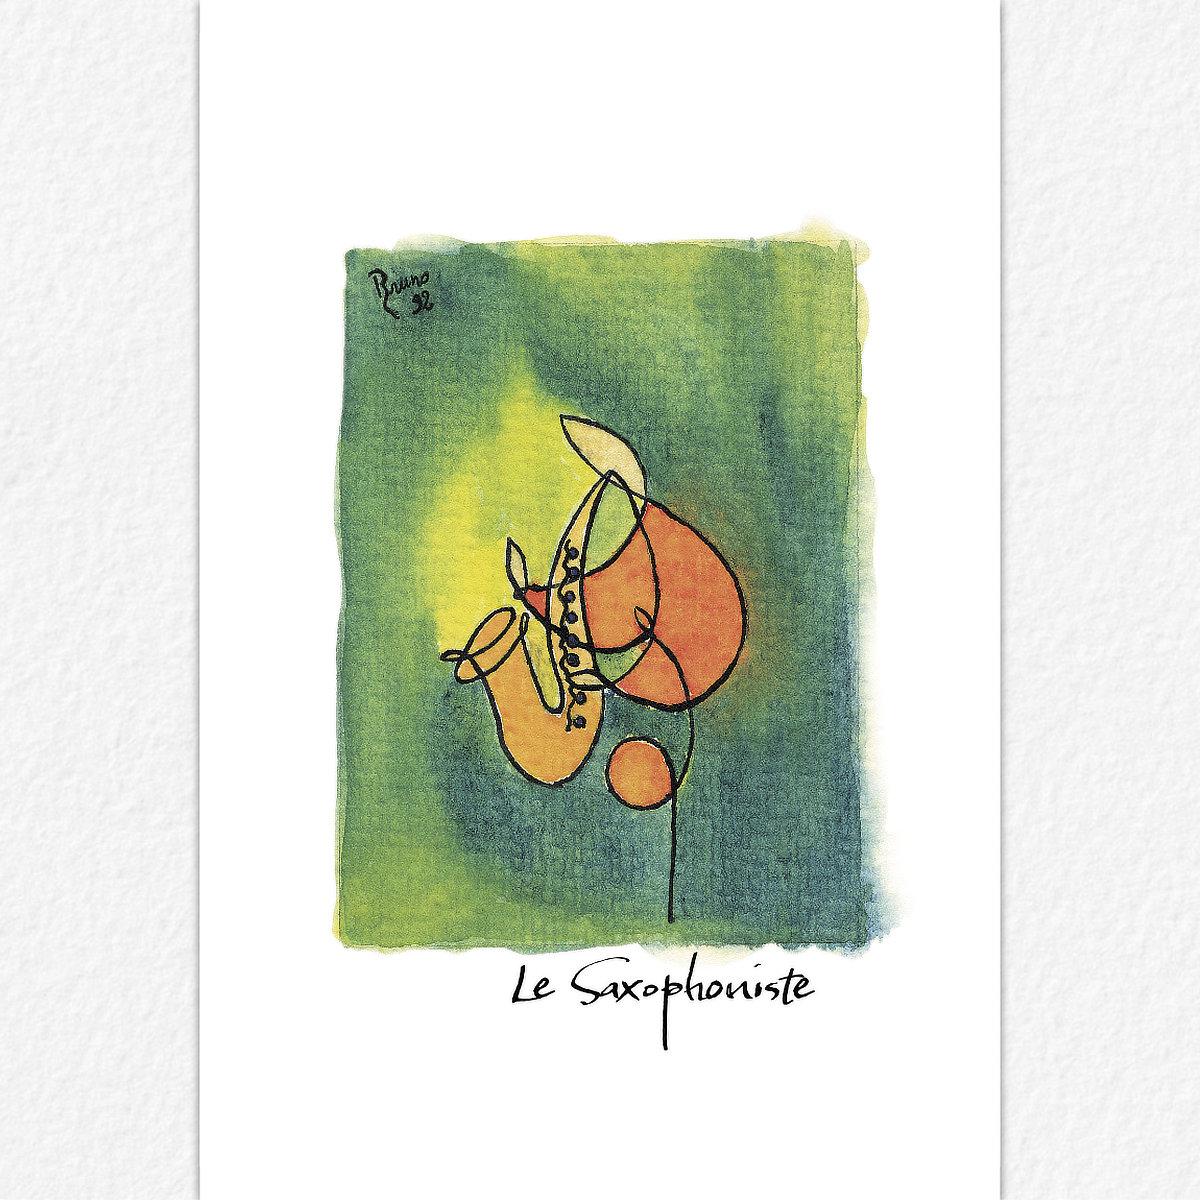 Le Saxophoniste - carte postale